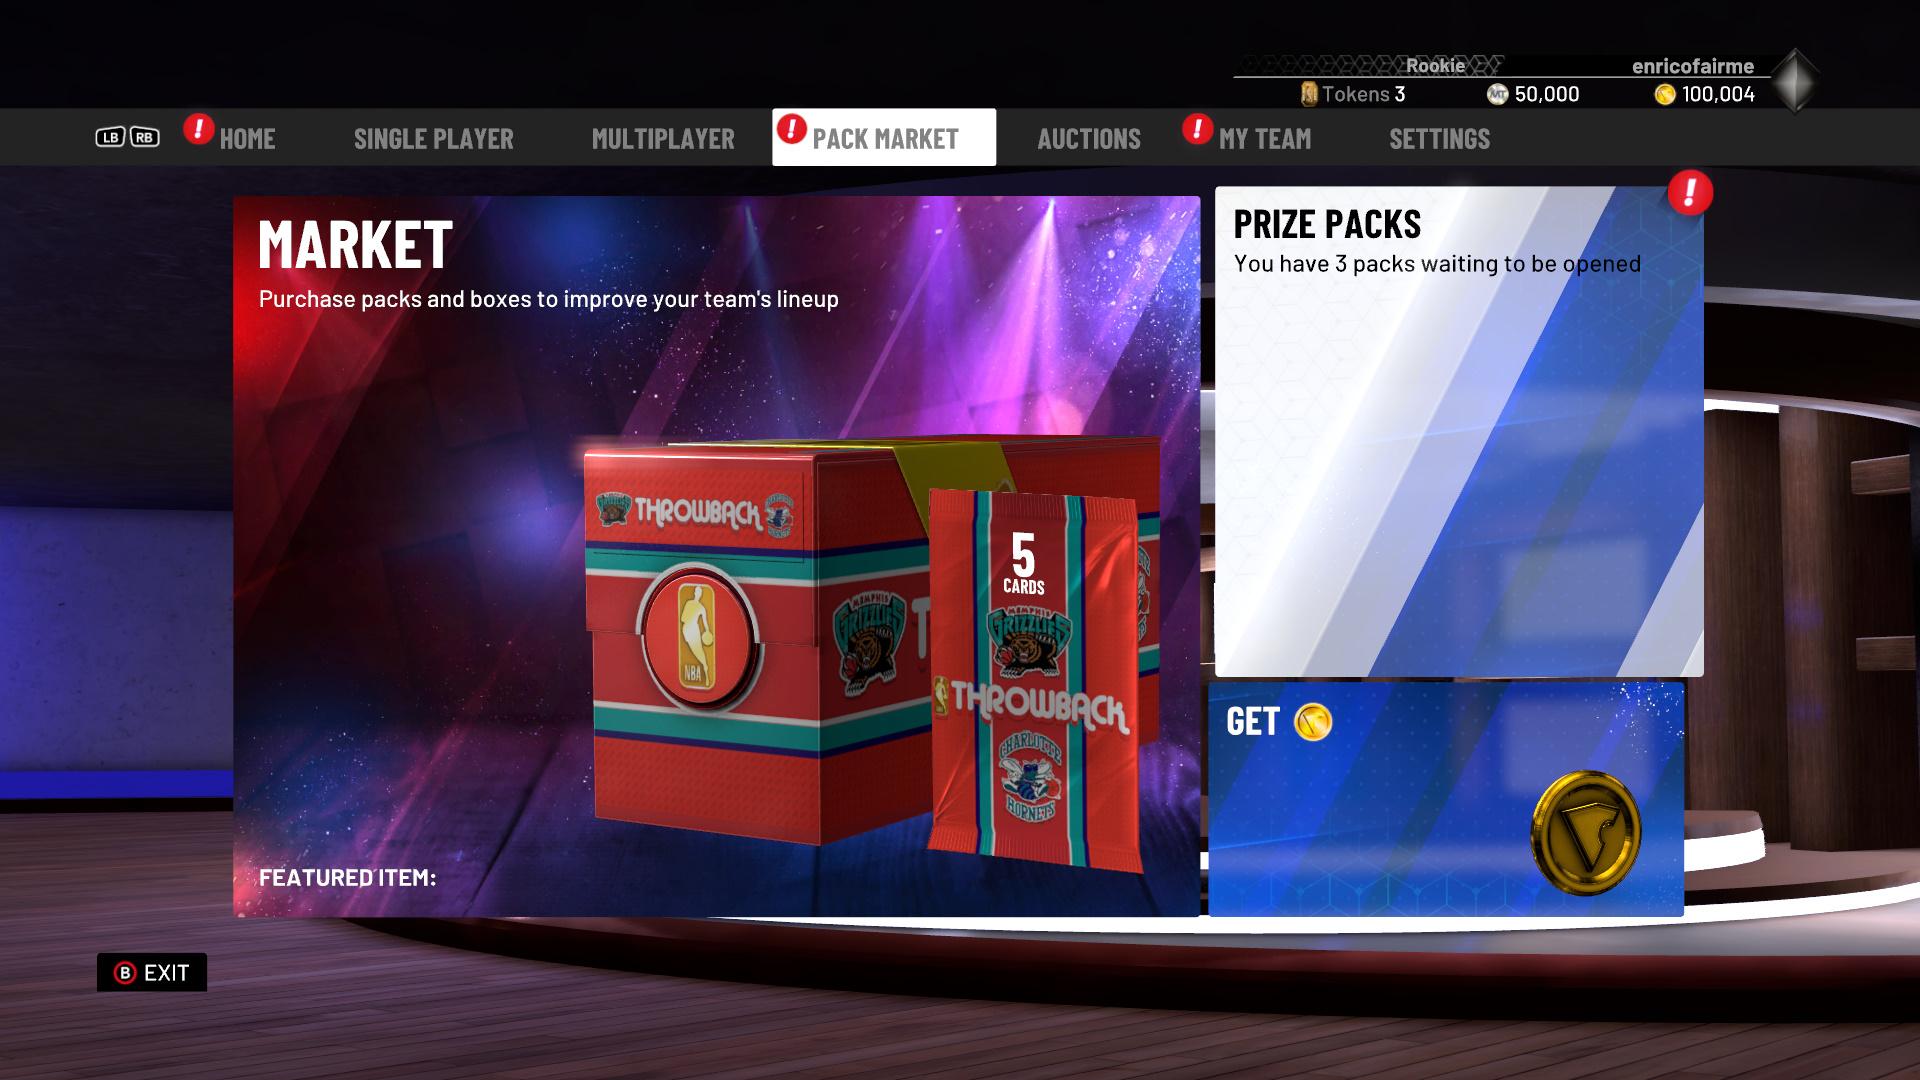 How to Access NBA 2K19 DLC Items